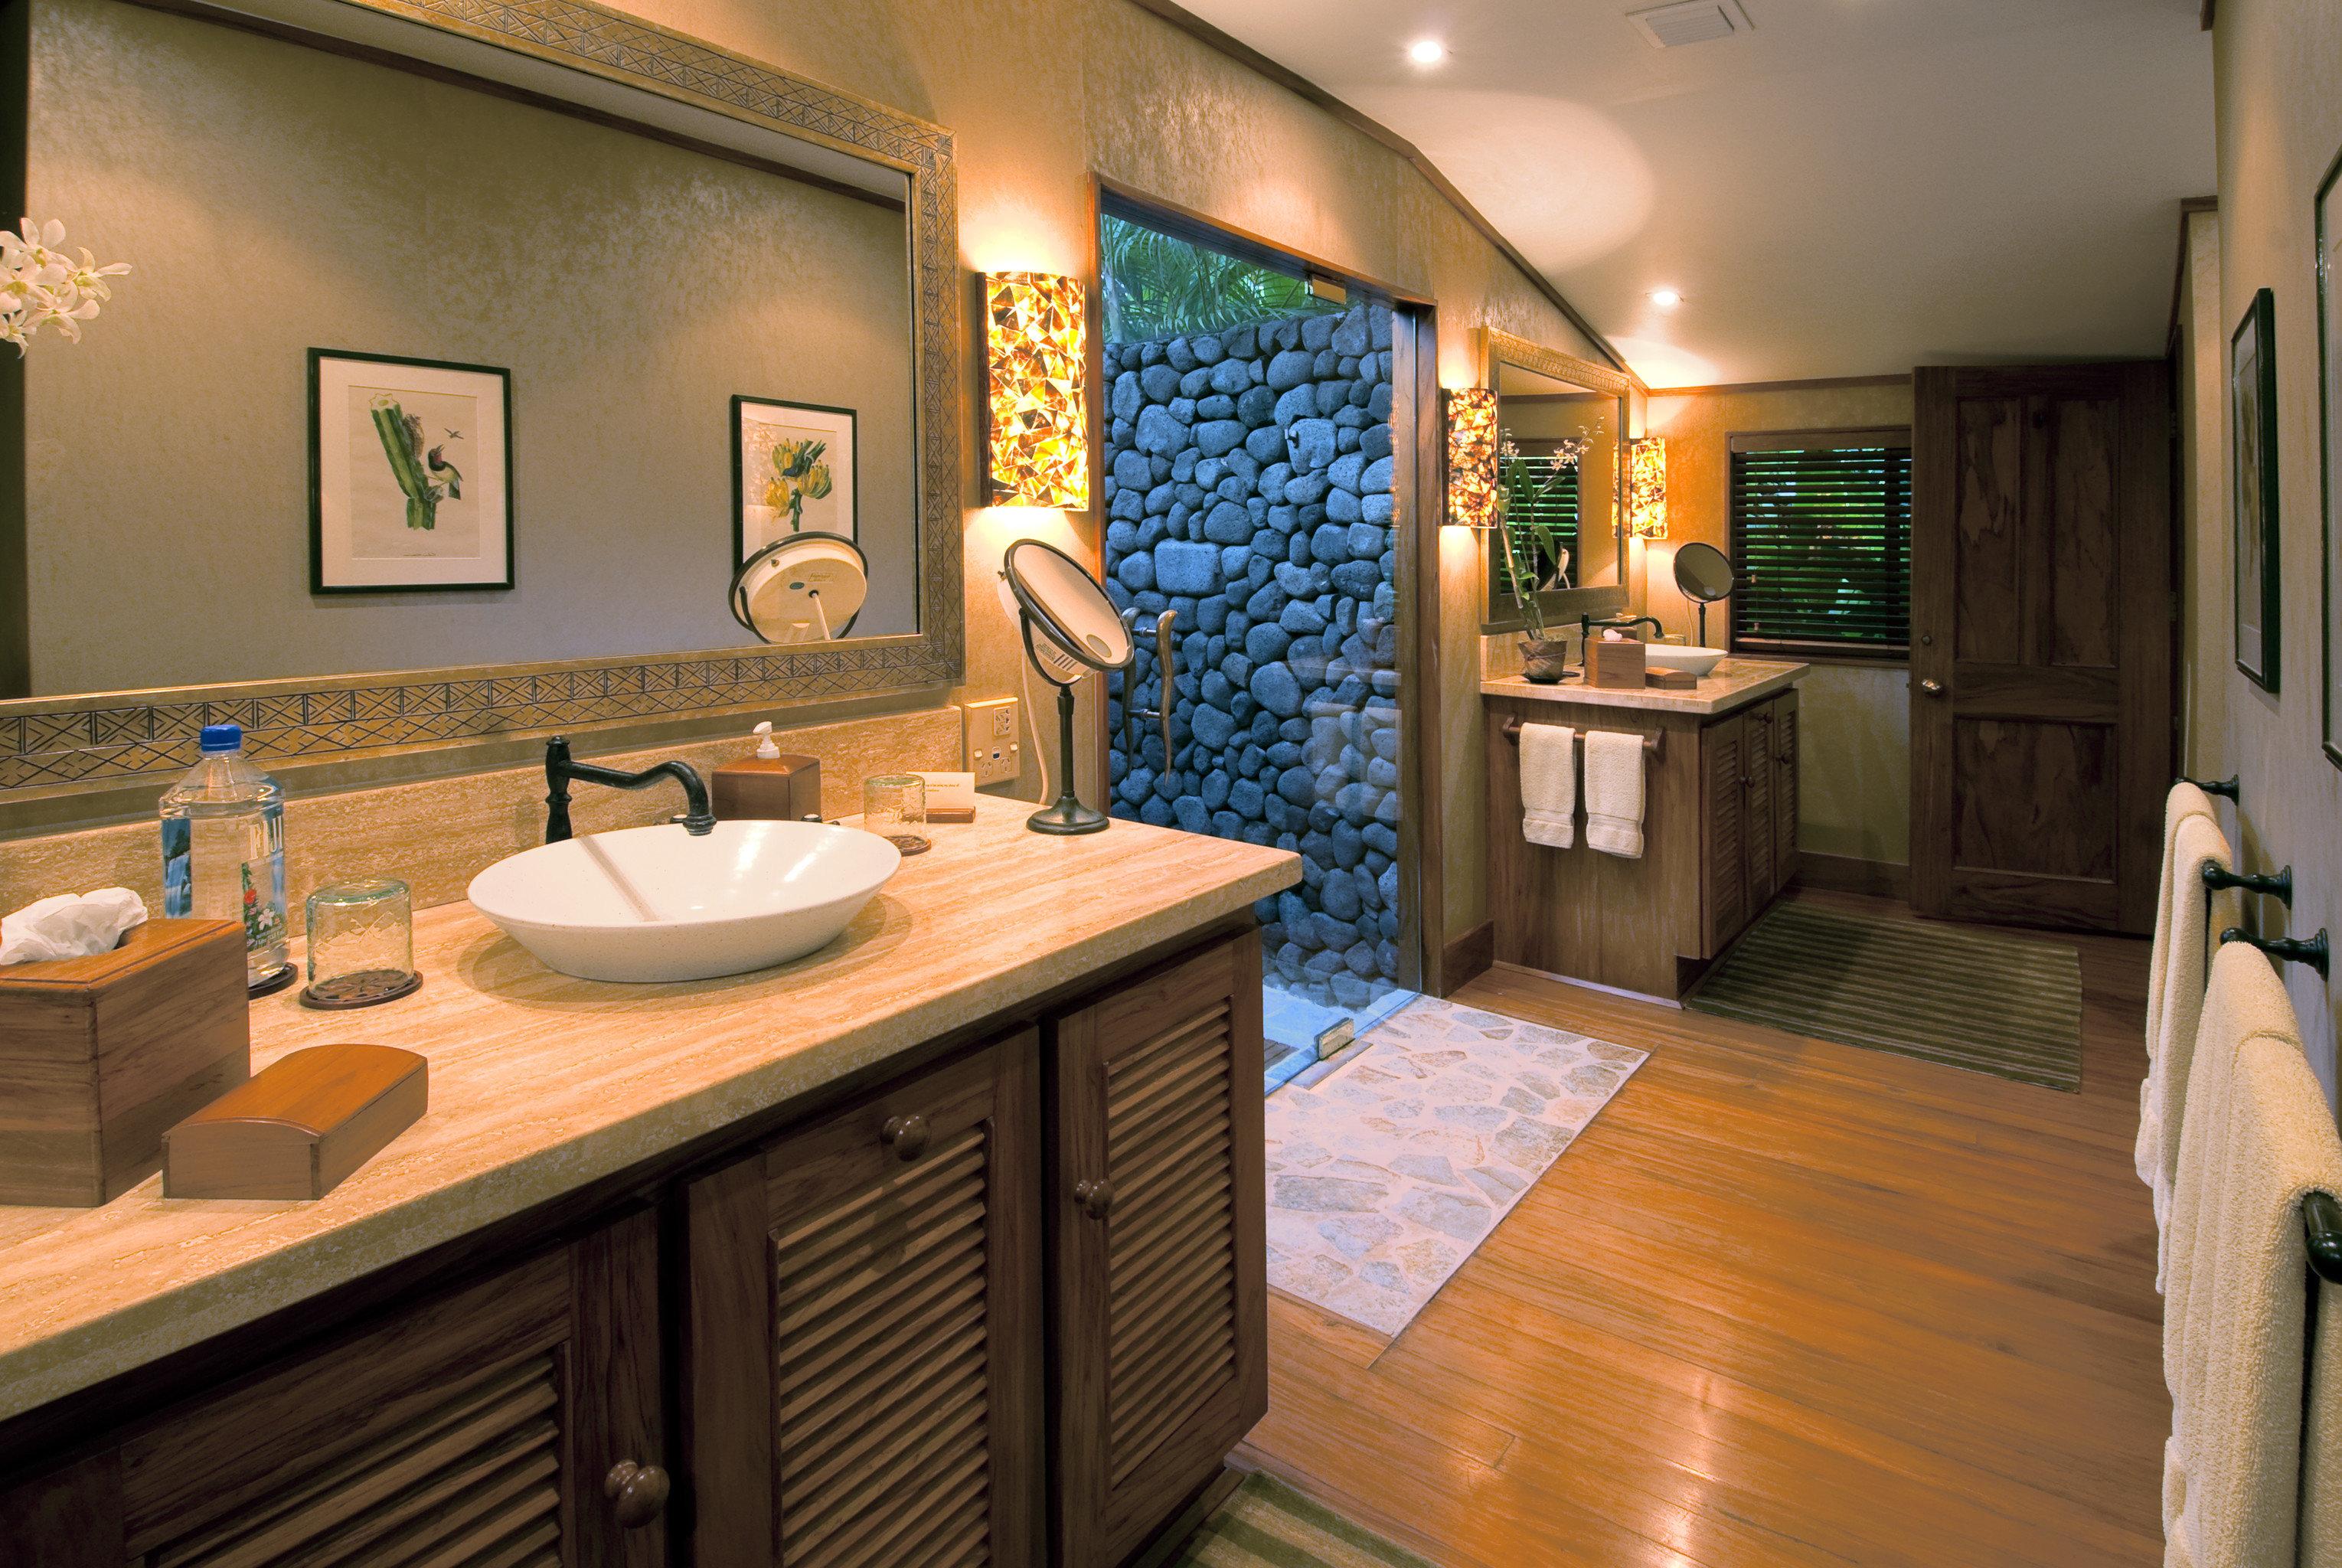 bathroom property home sink Kitchen cottage Suite counter Modern Island